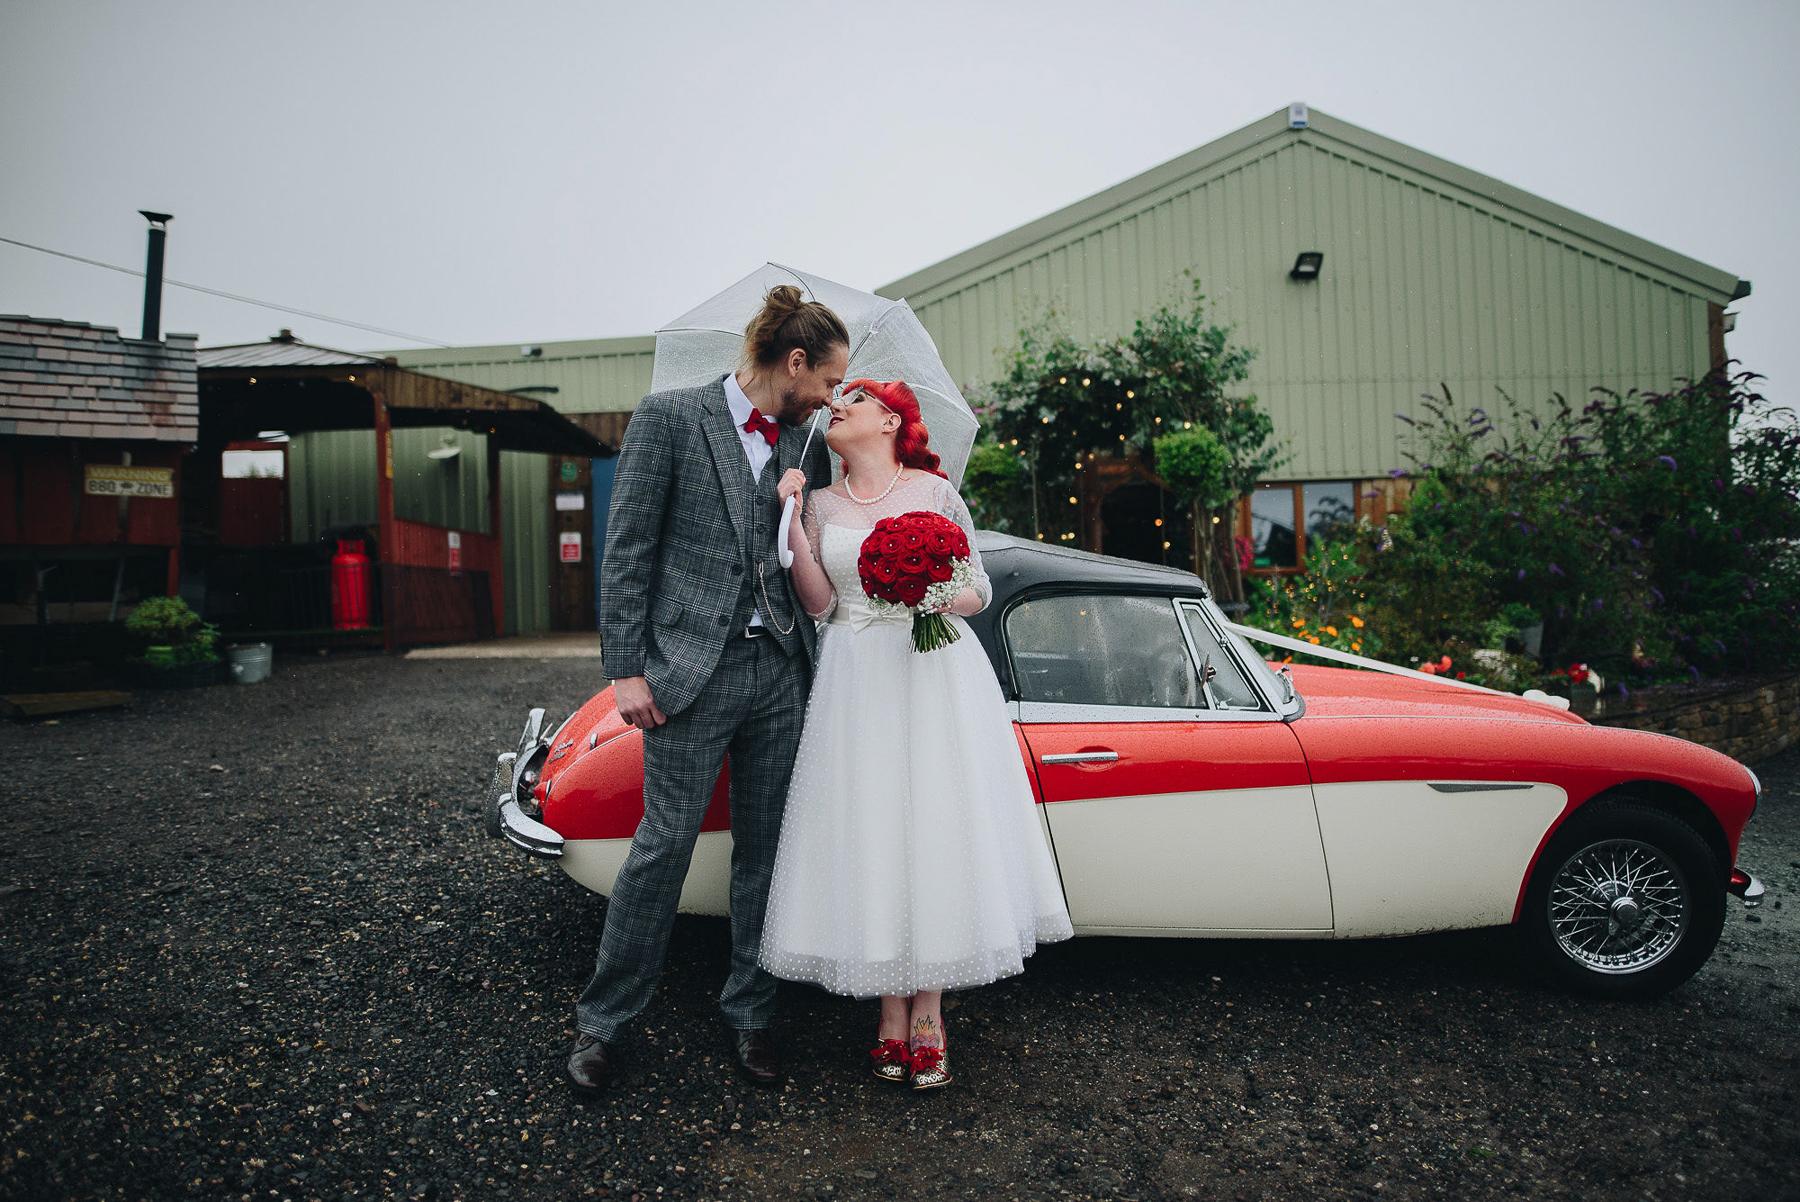 Wellbeing_Farm_Wedding_Photography_The_Pin-Up_Bride_Lara_Shaun-92.jpg